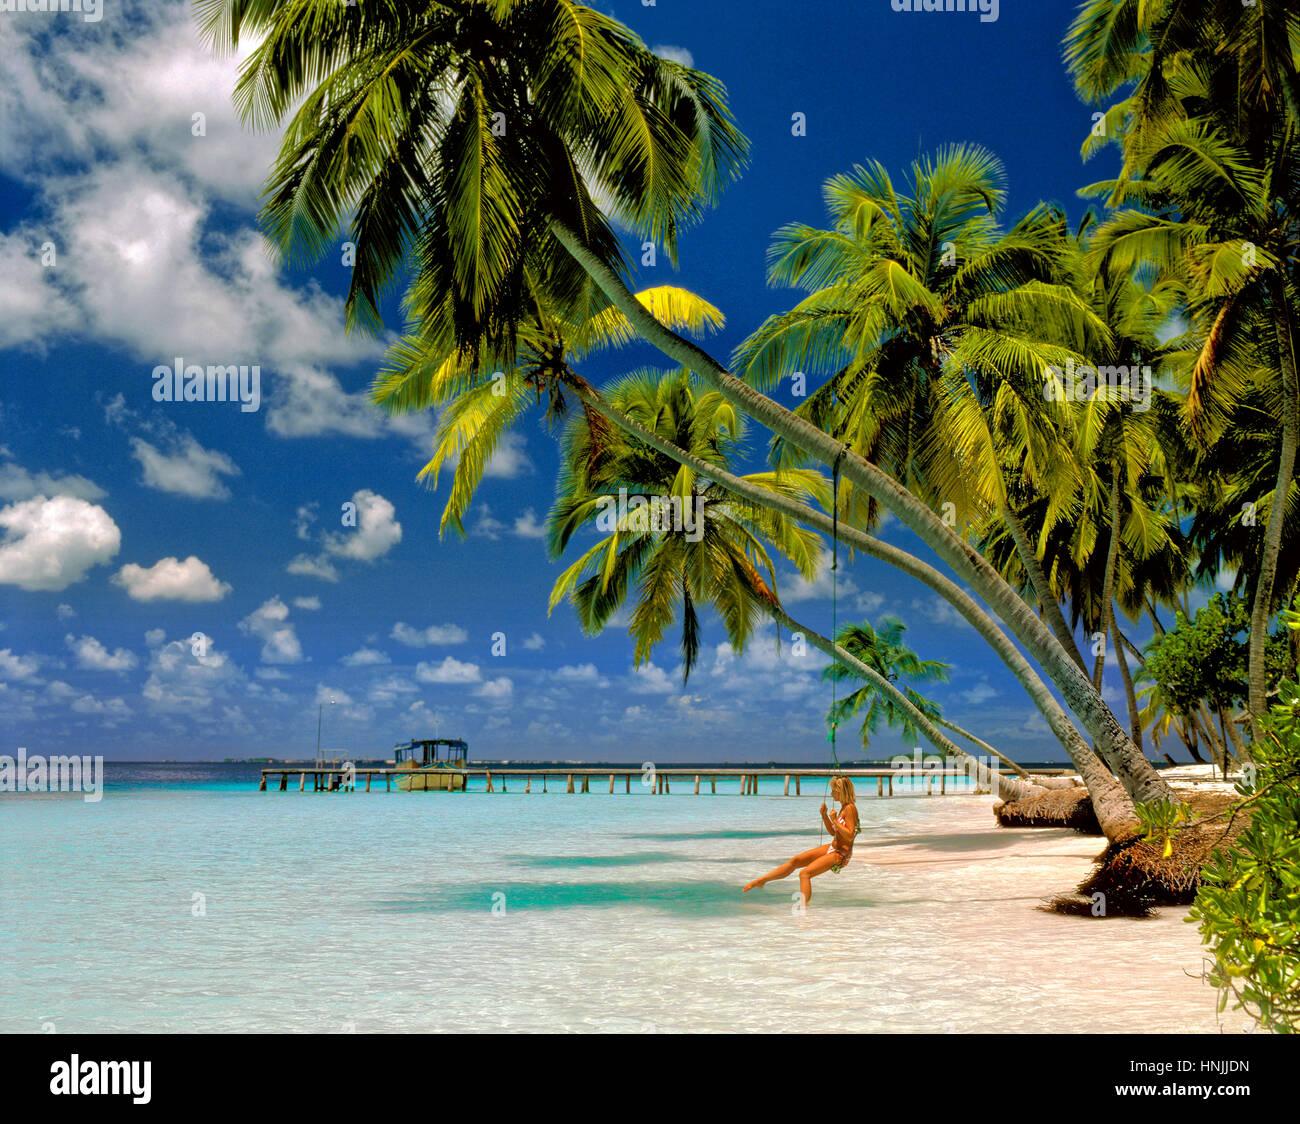 Girl on Swing Under Palm Trees, Kuda Bandos Island, North Male Atoll, Maldives, Maldive Republic, Indian Ocean Atoll. Stock Photo